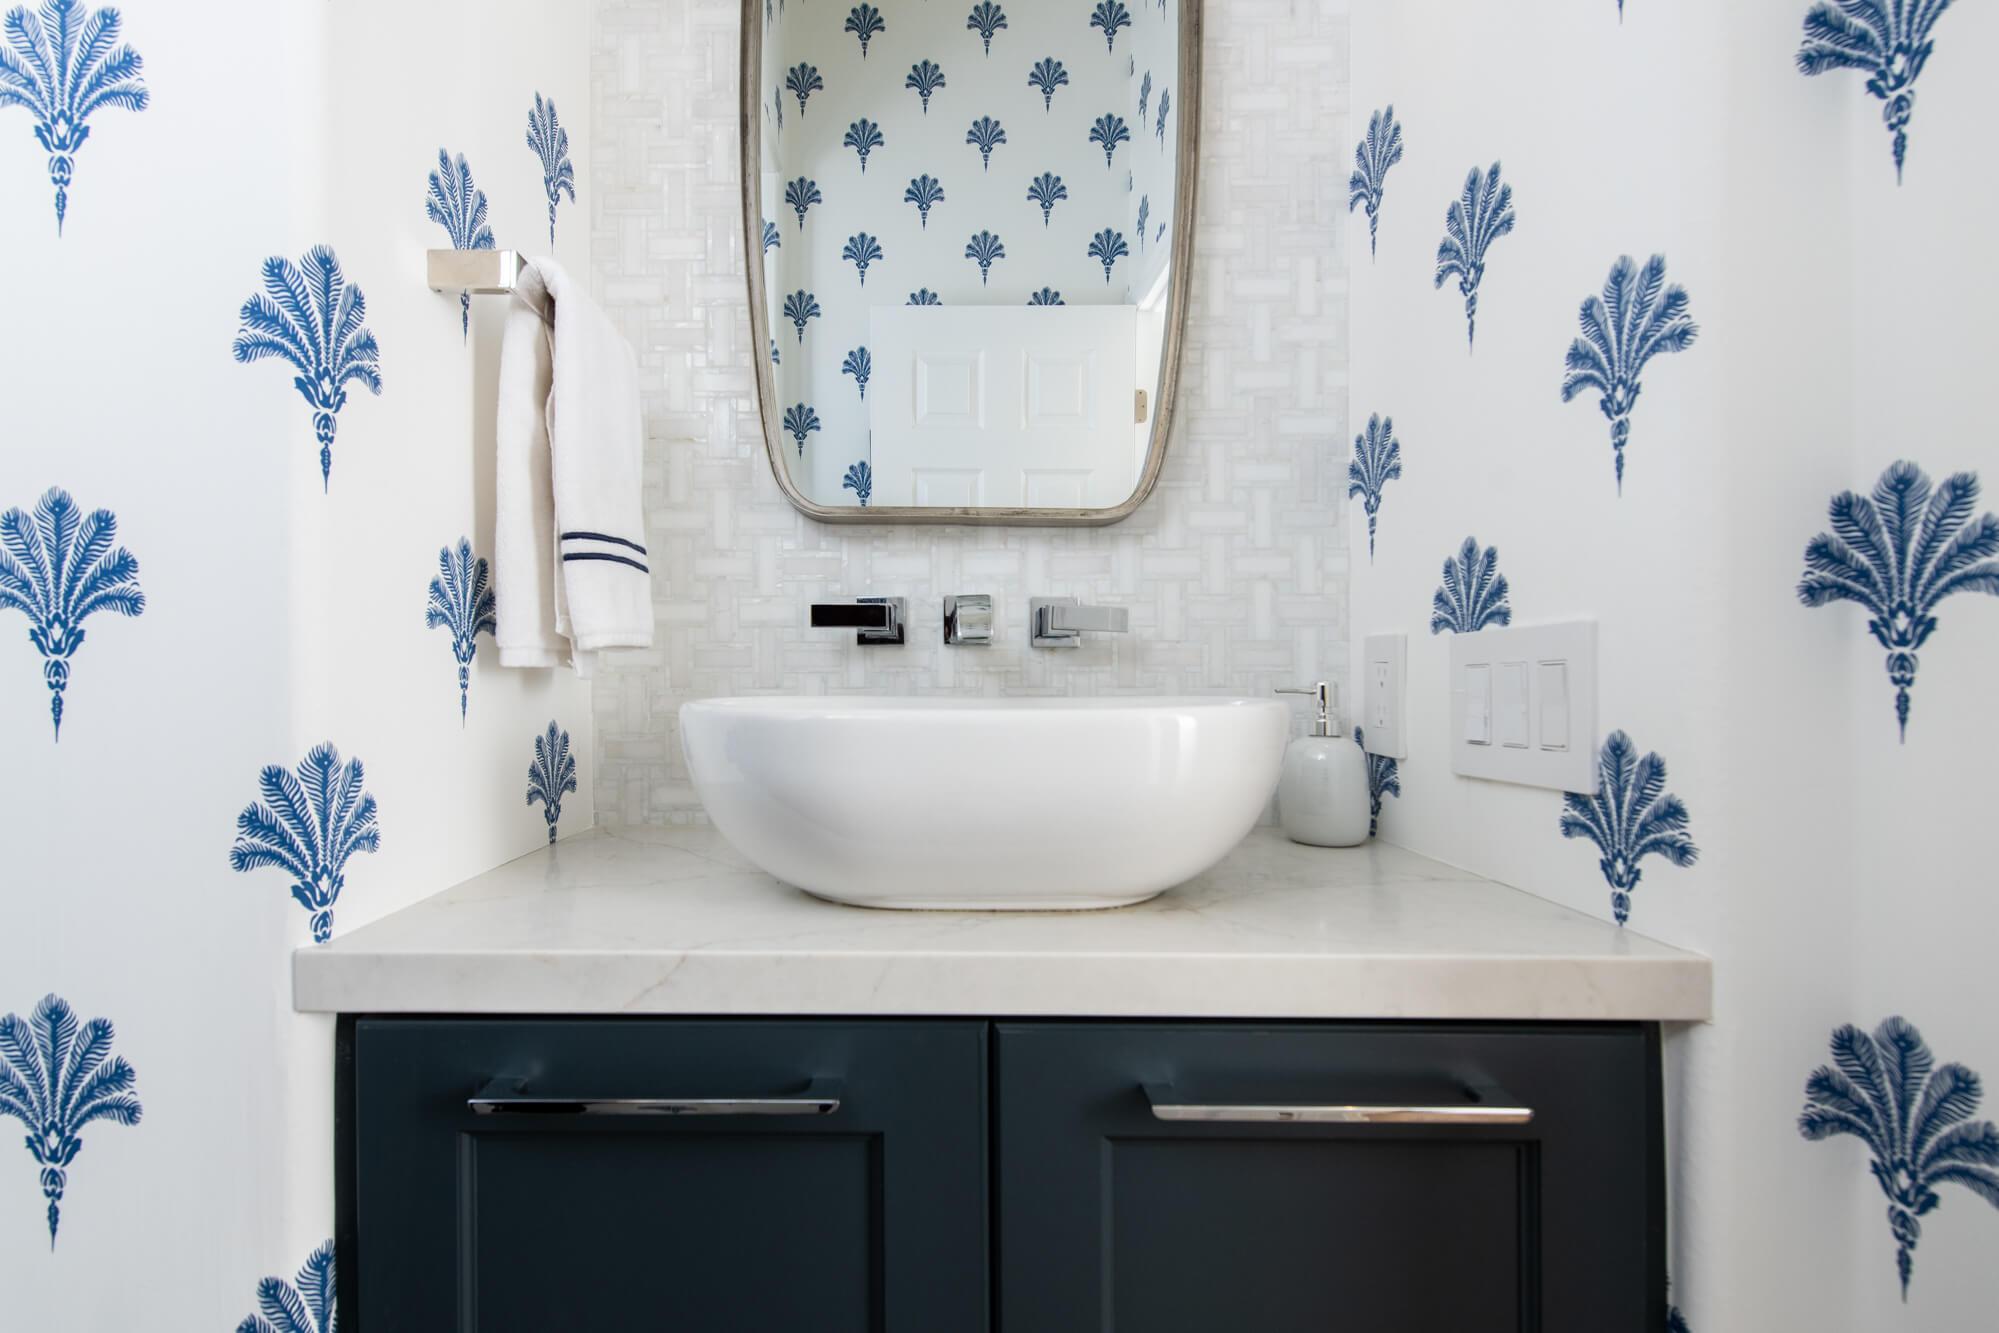 Patterned-wall-paper-in-powder-Rancho-Santa-Margarita-powder-bathroom-remodel